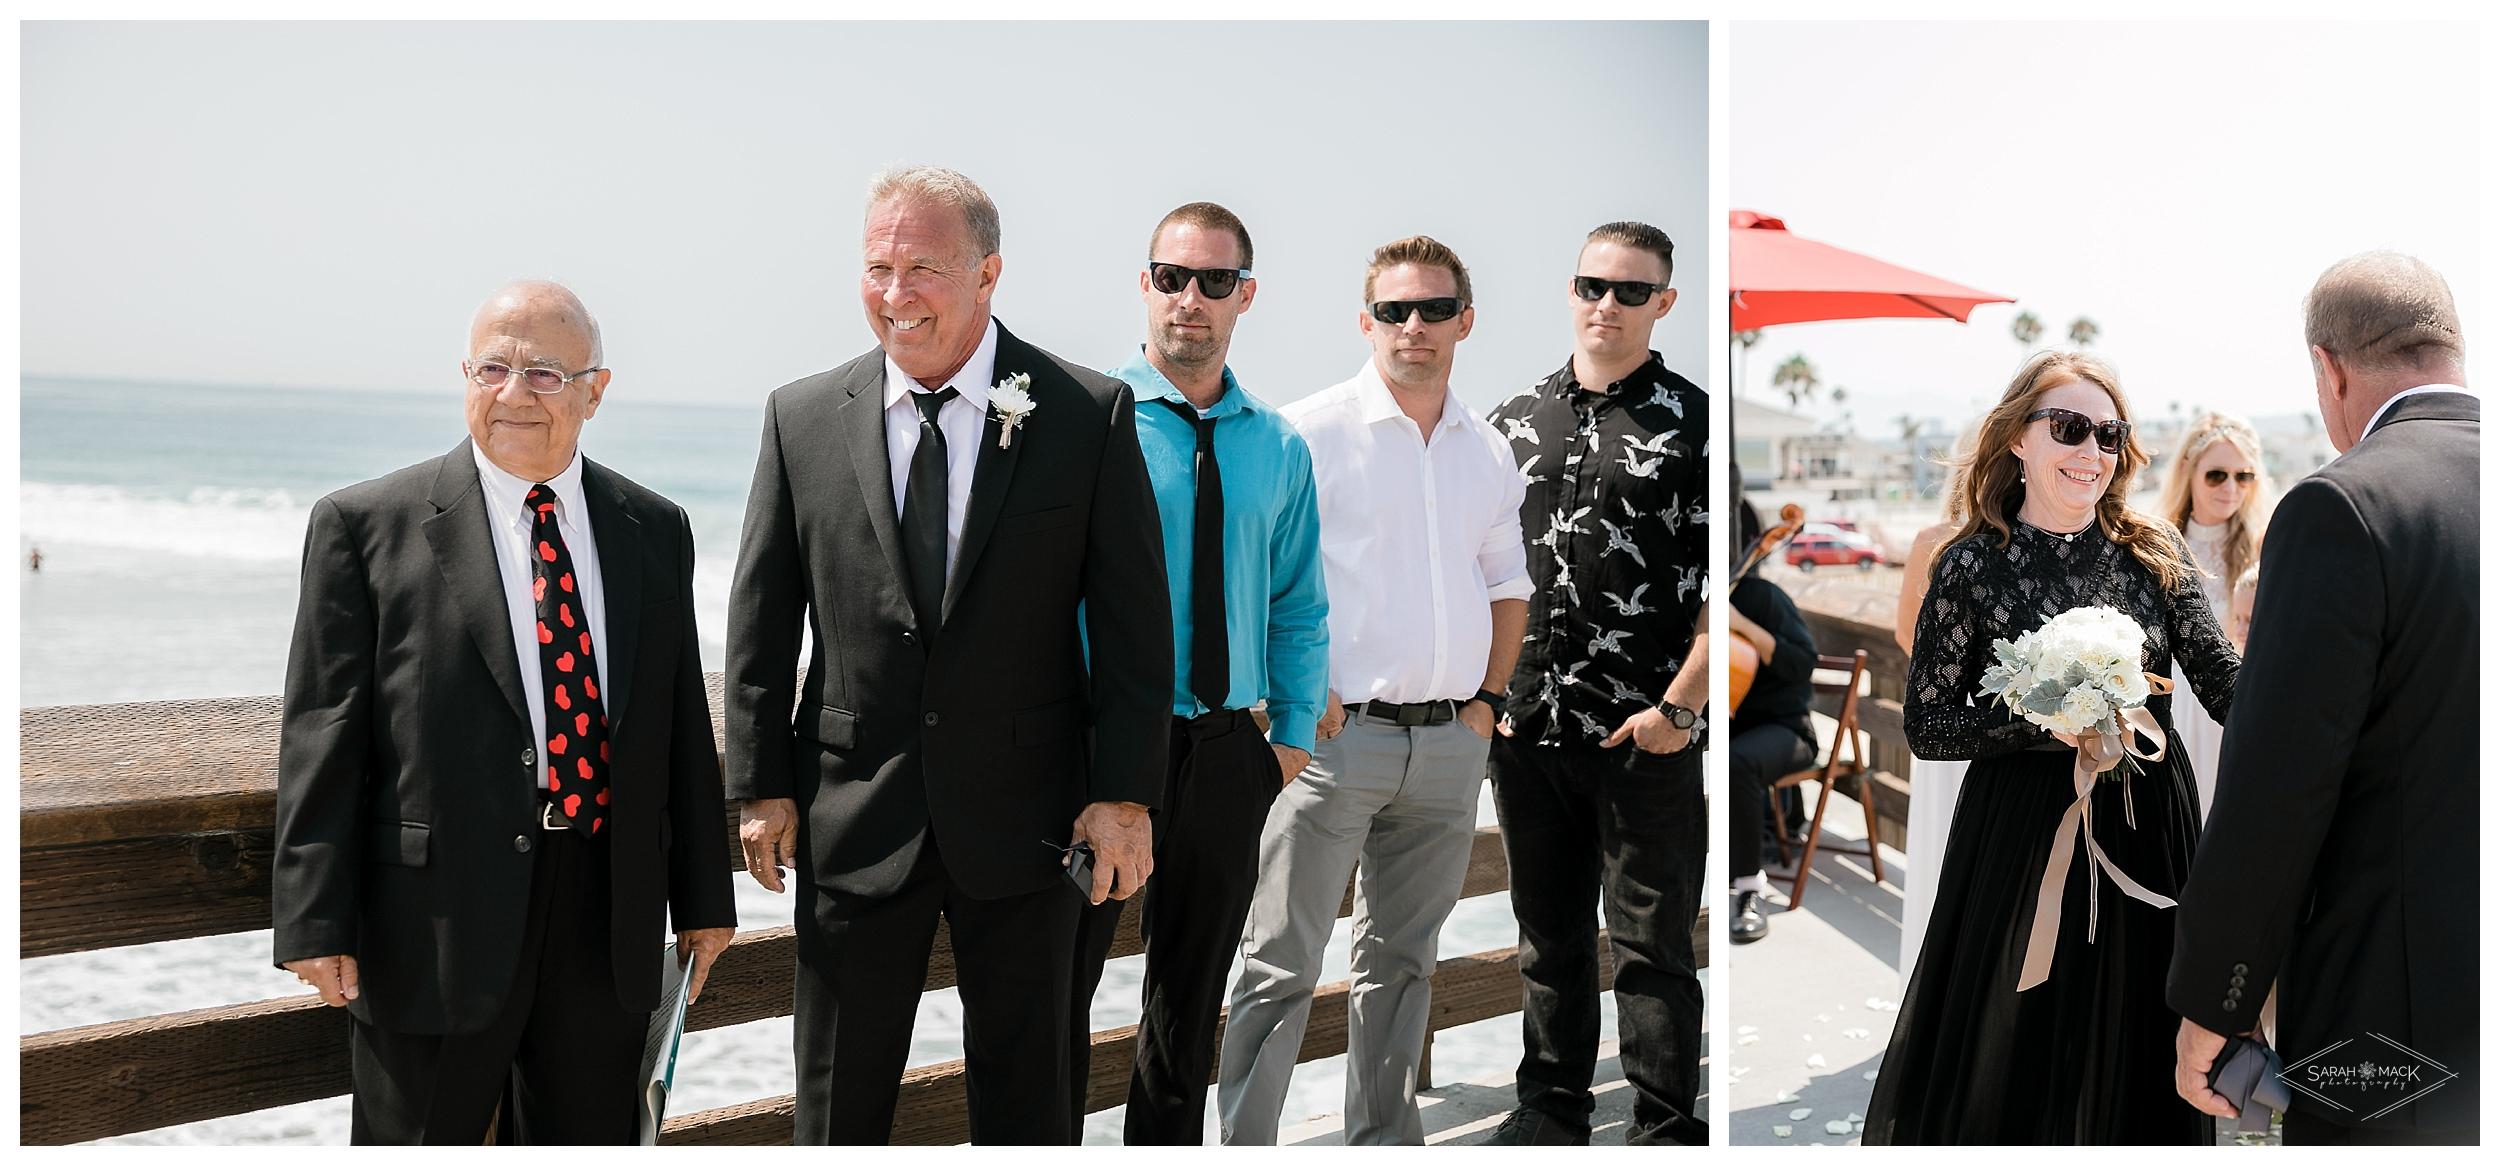 LM-Newport-Beach-Pier-Intimate-Wedding-Photography 67.jpg